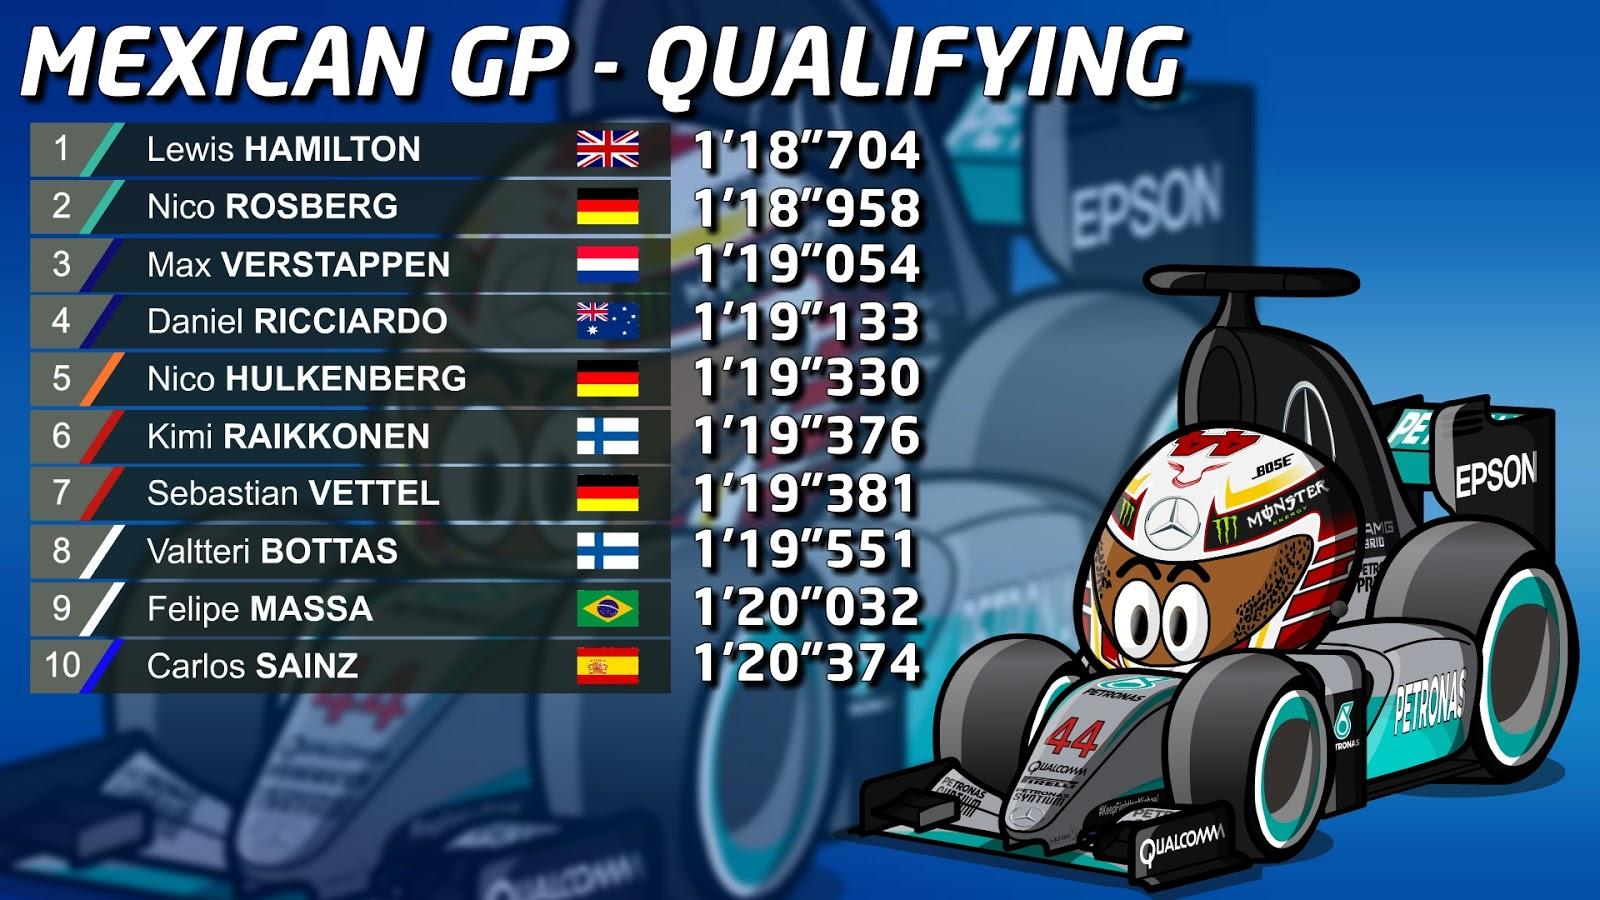 f1 mexico qualifying